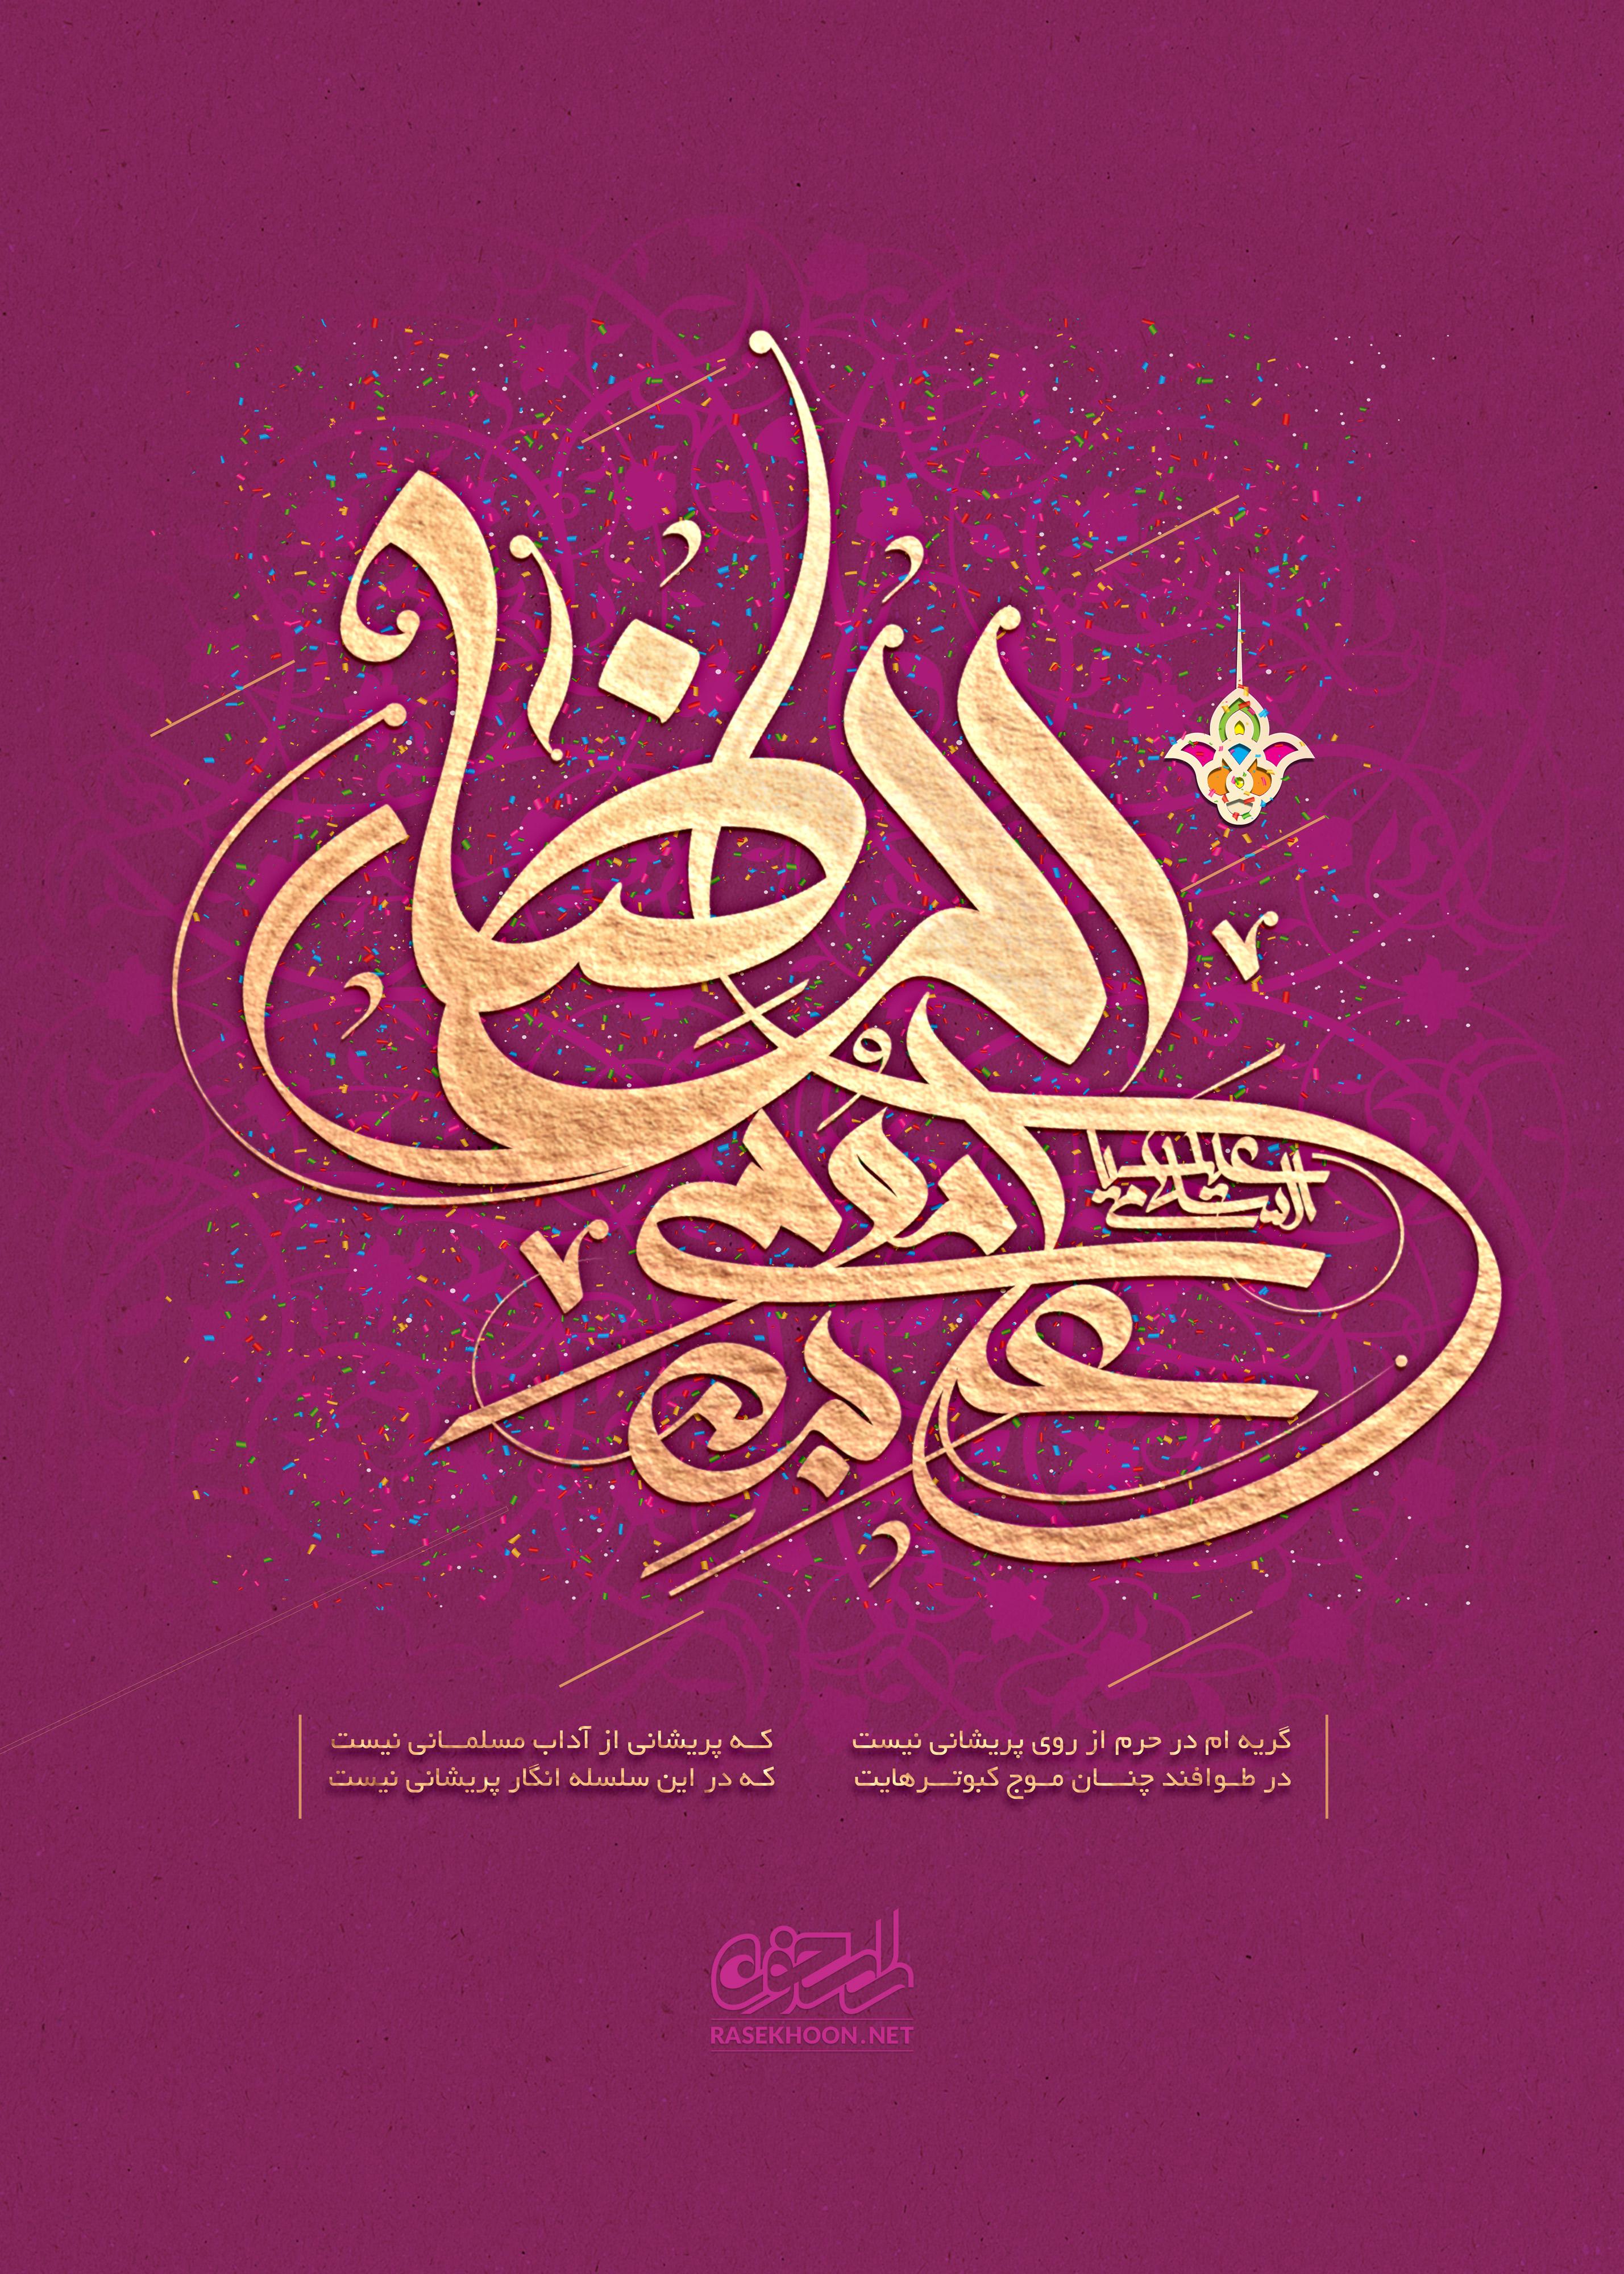 پوستر باکیفیت میلاد امام رضا علیه السلام